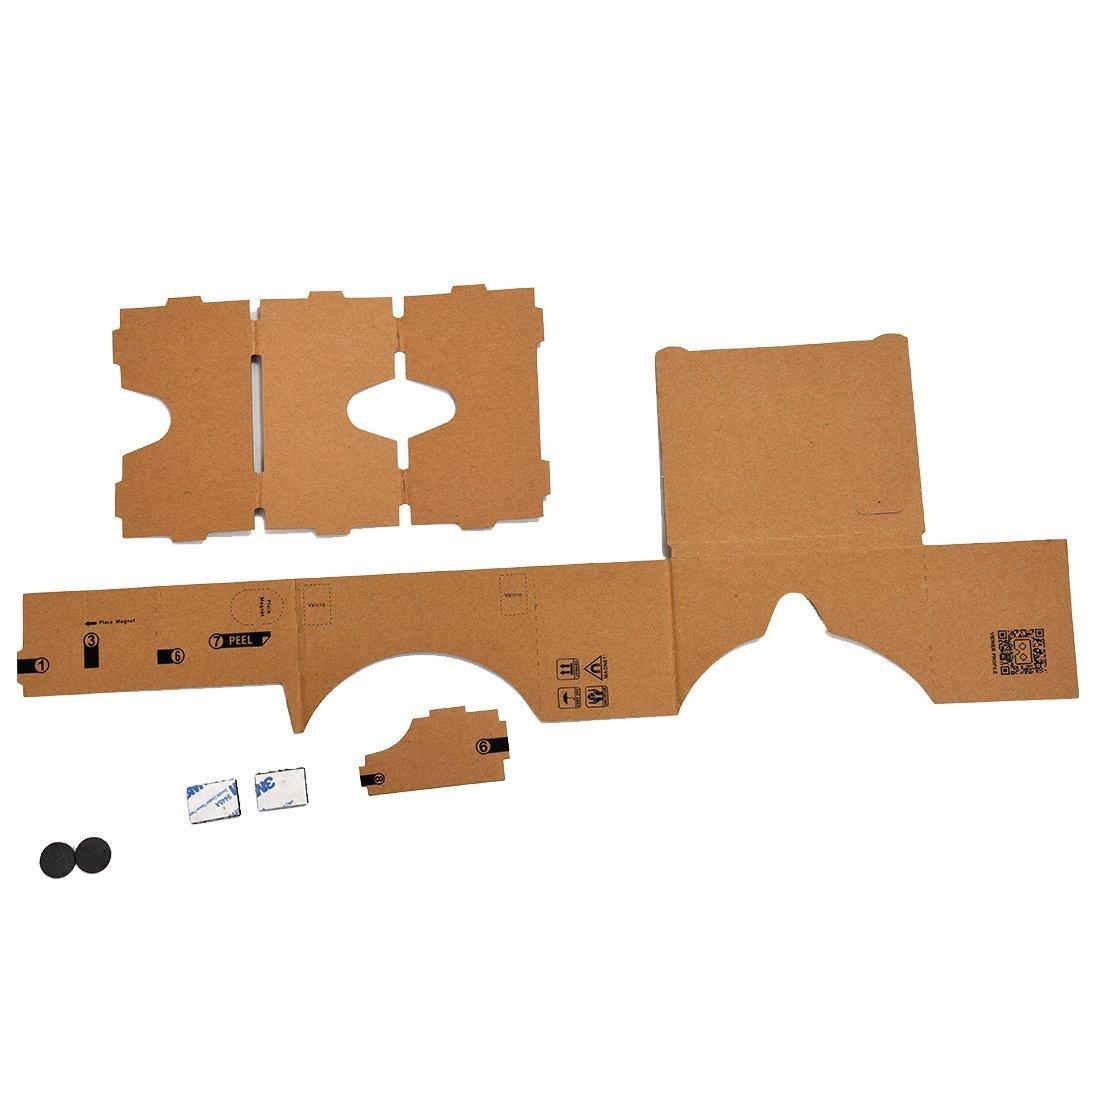 3D Virtual Reality Glasses - TOOGOO (R) Mobile phone cardboard quality 3D Virtual Reality Glasses by SODIAL (Image #2)